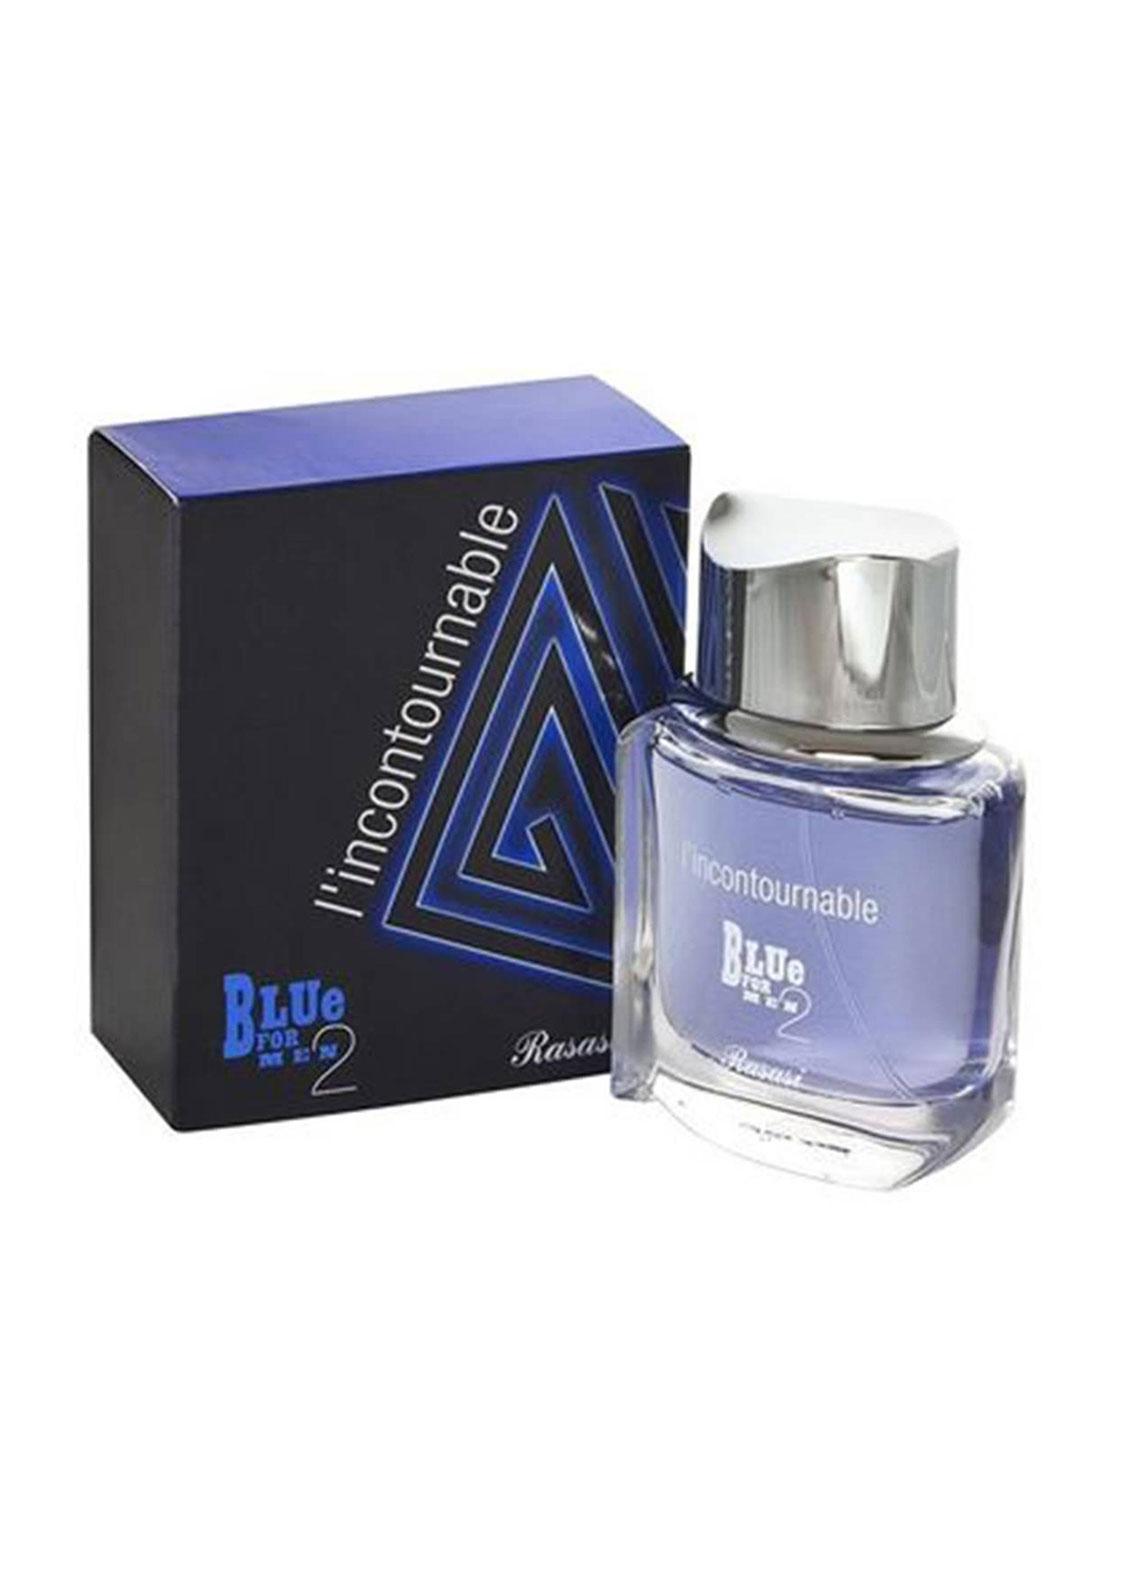 Rasasi Lincontournable Blue 2 men's perfume